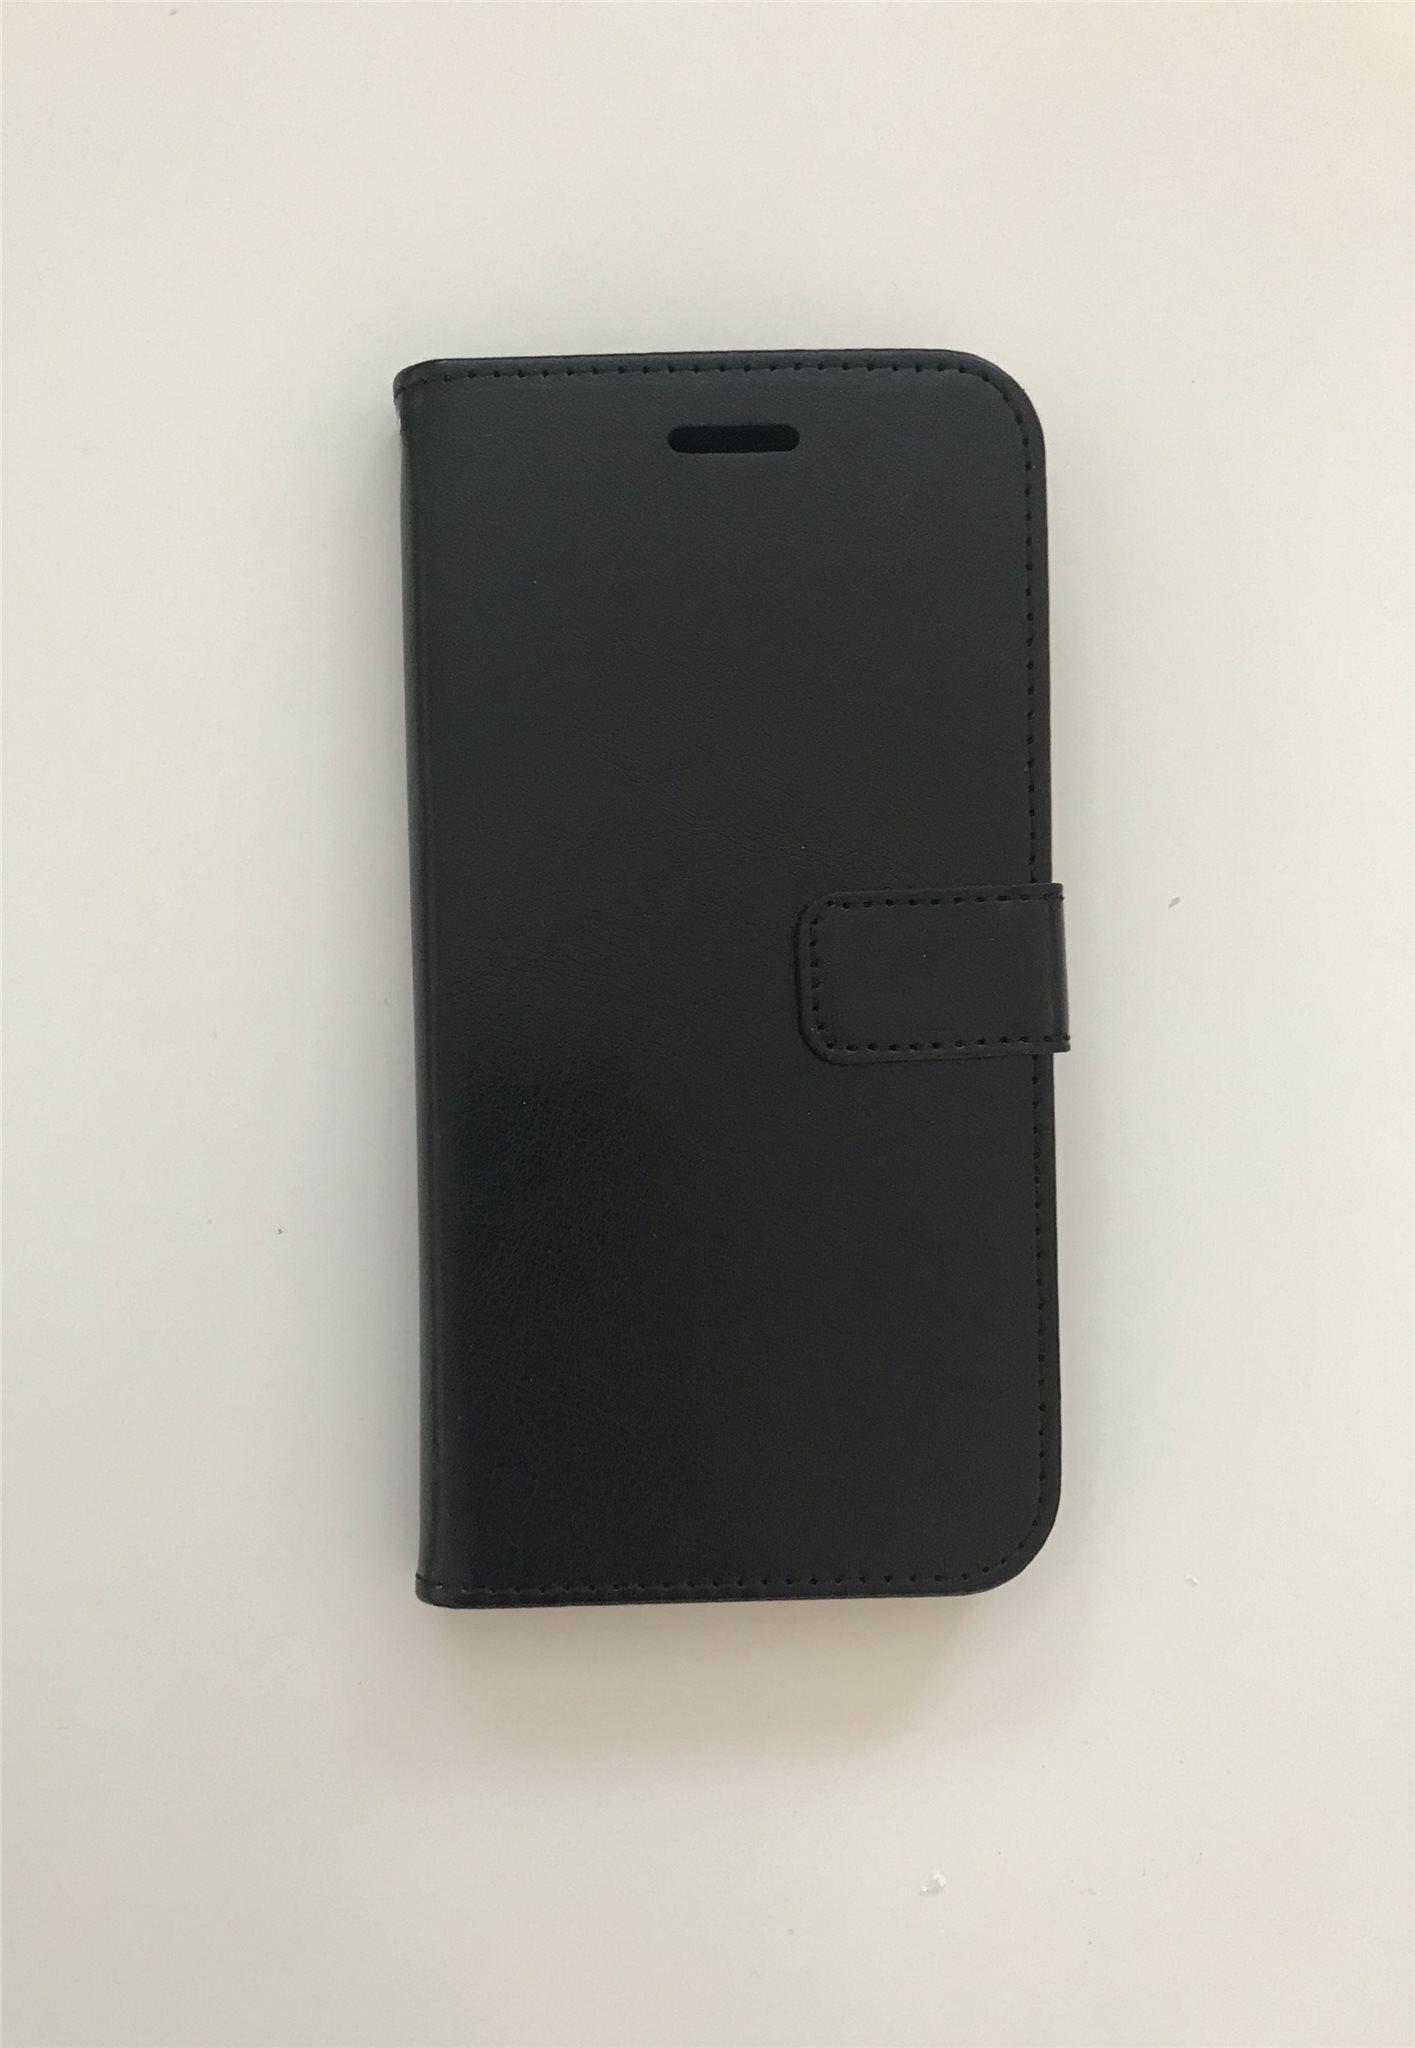 Läder Plånbok iPhone 8 Plus iPhone 7 Plus Svart (341660987) ᐈ Köp ... 8959322e77143